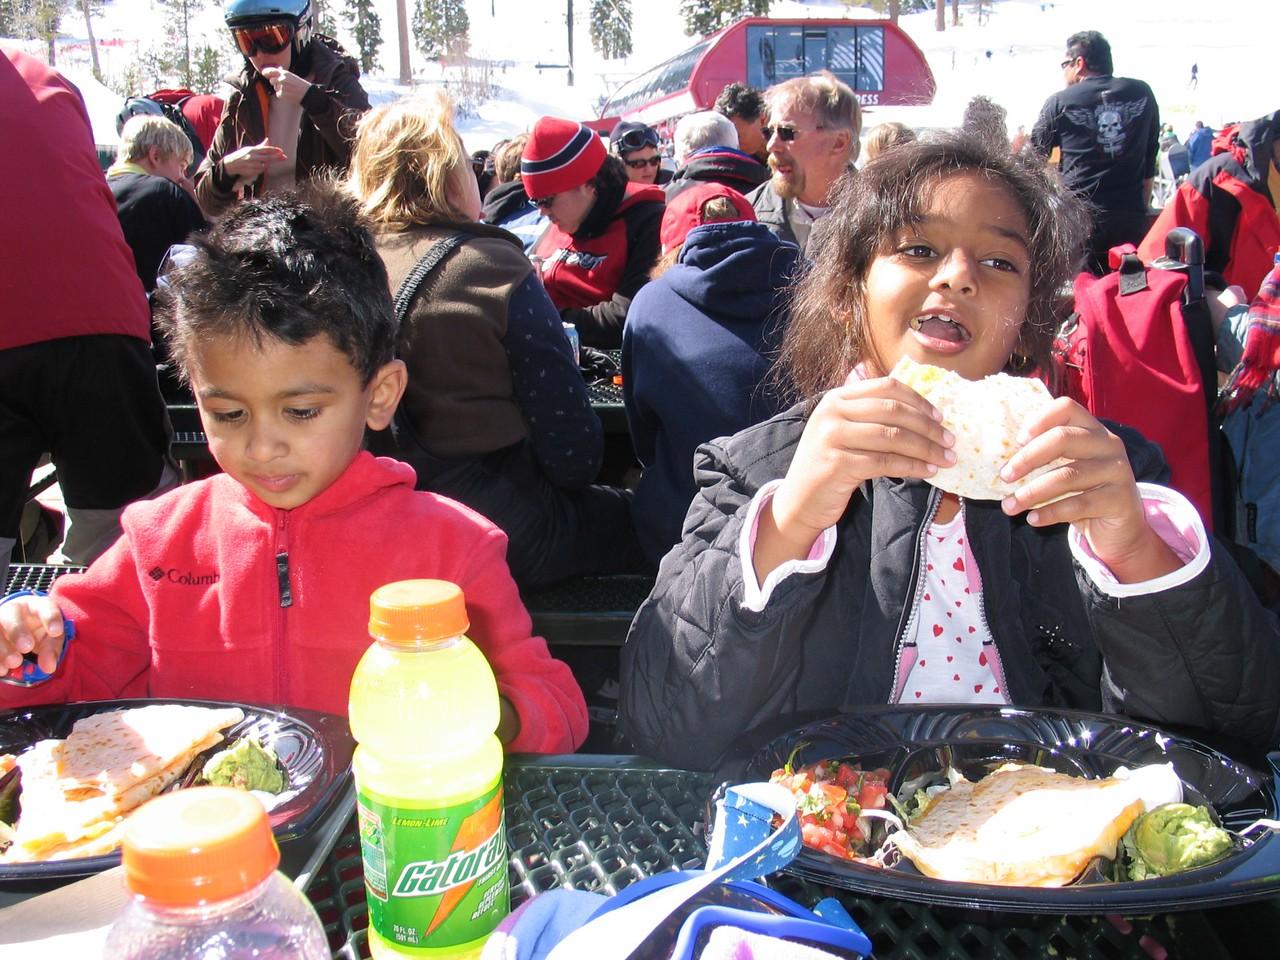 Lunchtime!  Quesadillas!   Mmmmmmm.....